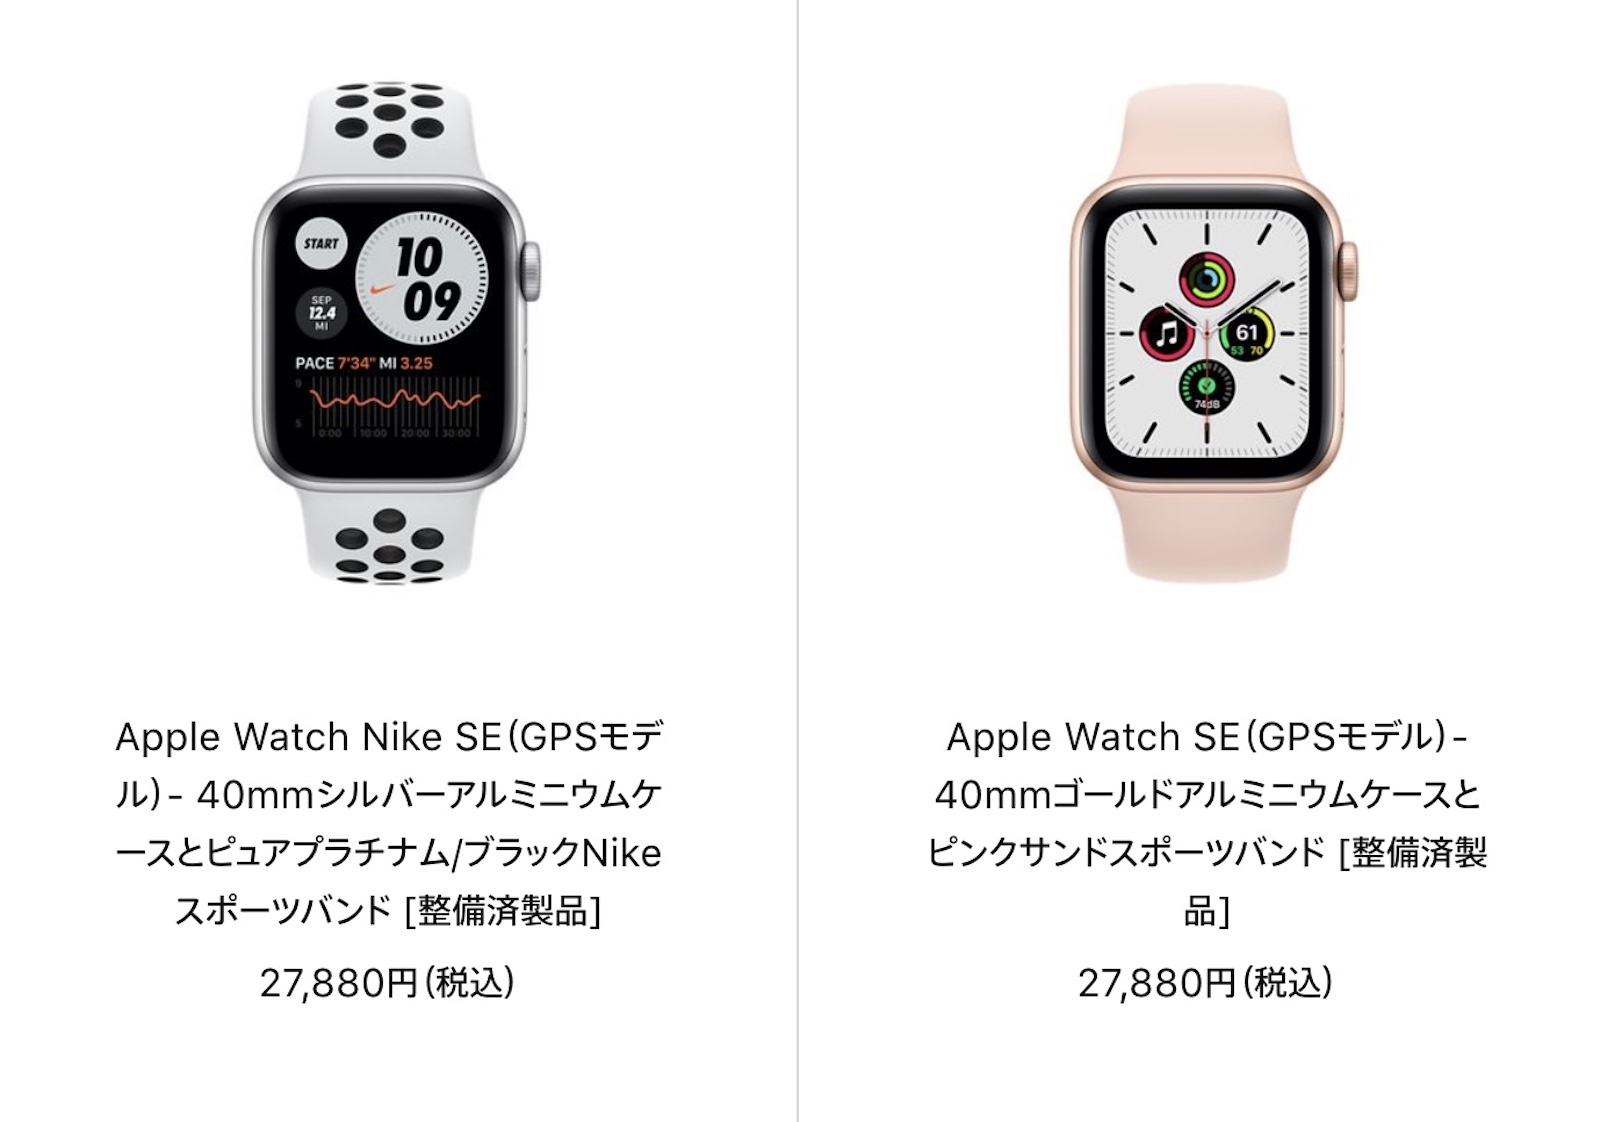 AppleWatch Refurbished model 2021 07 16